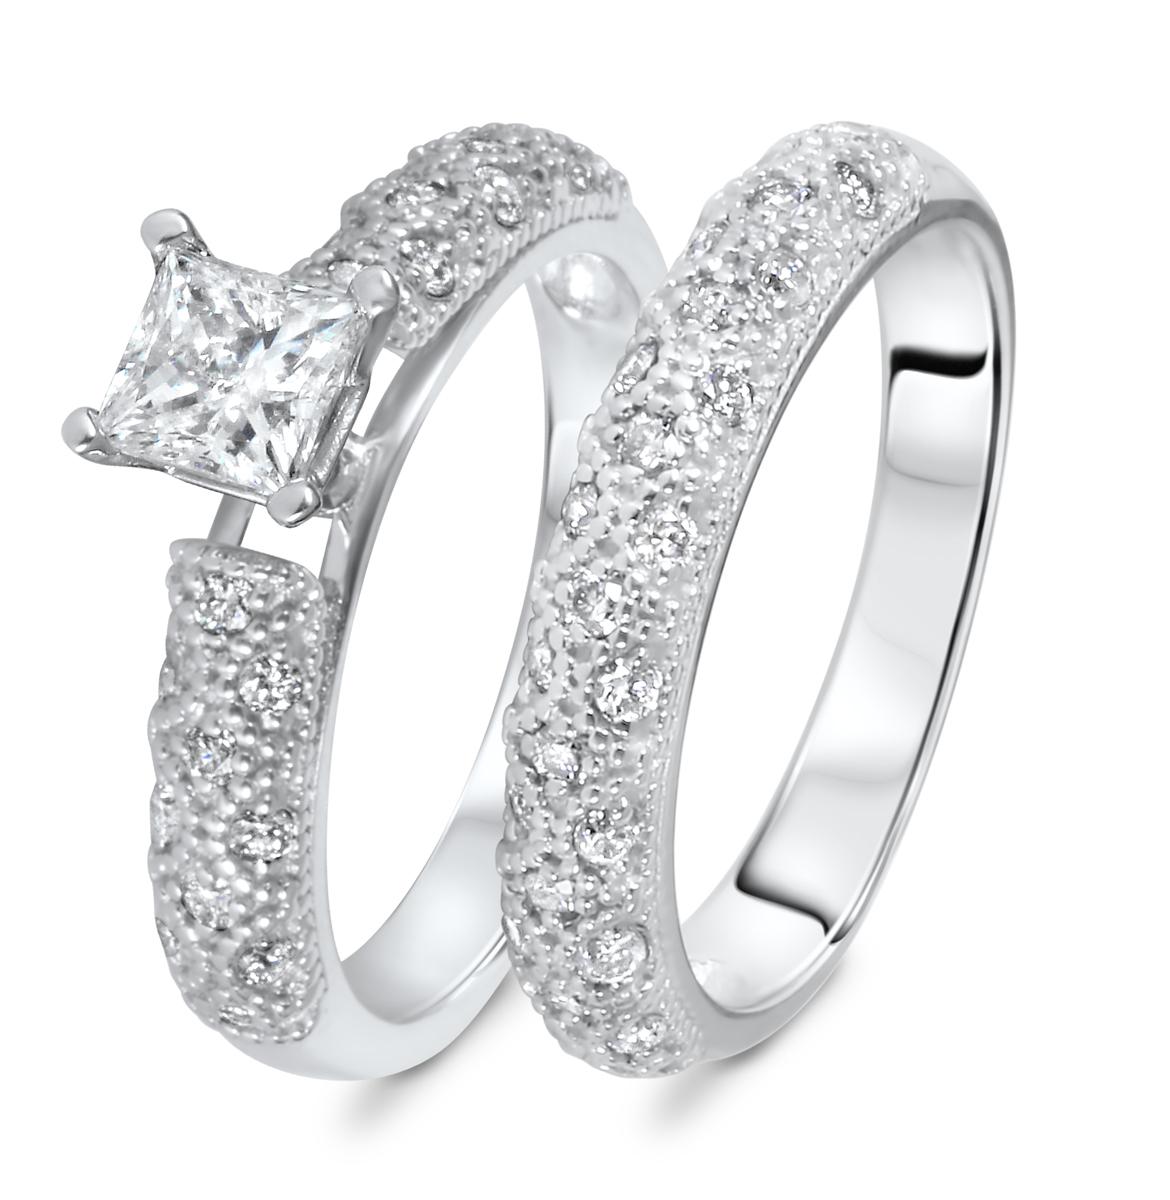 1 CT. T.W. Diamond Women's Bridal Wedding Ring Set 10K White Gold